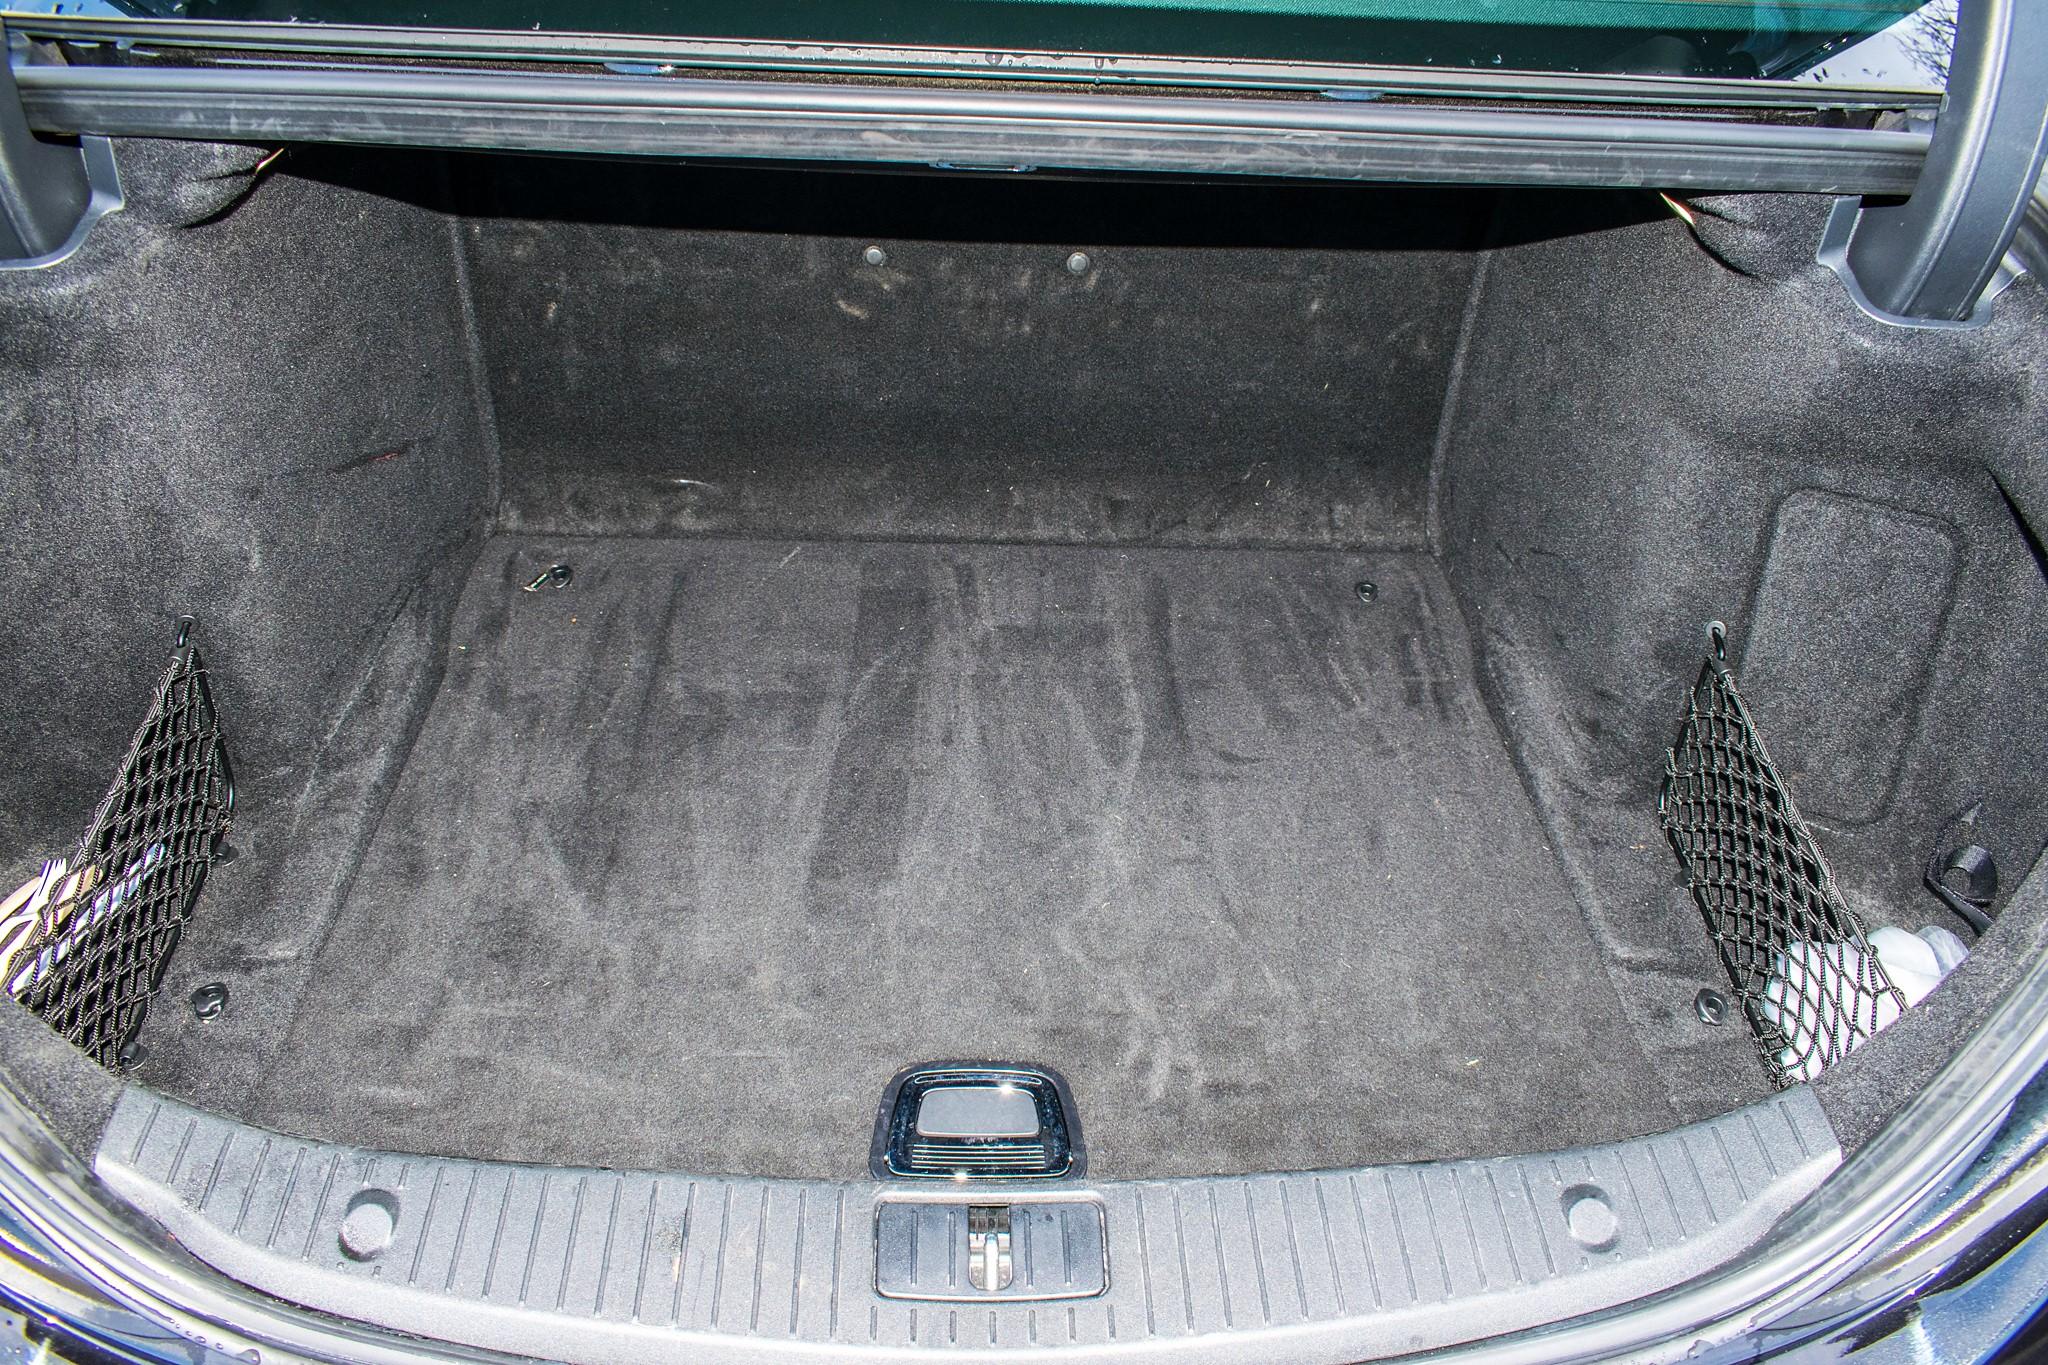 Mercedes Benz S450 L AMG Line Executive auto petrol 4 door saloon car Registration Number: FX68 - Image 31 of 33